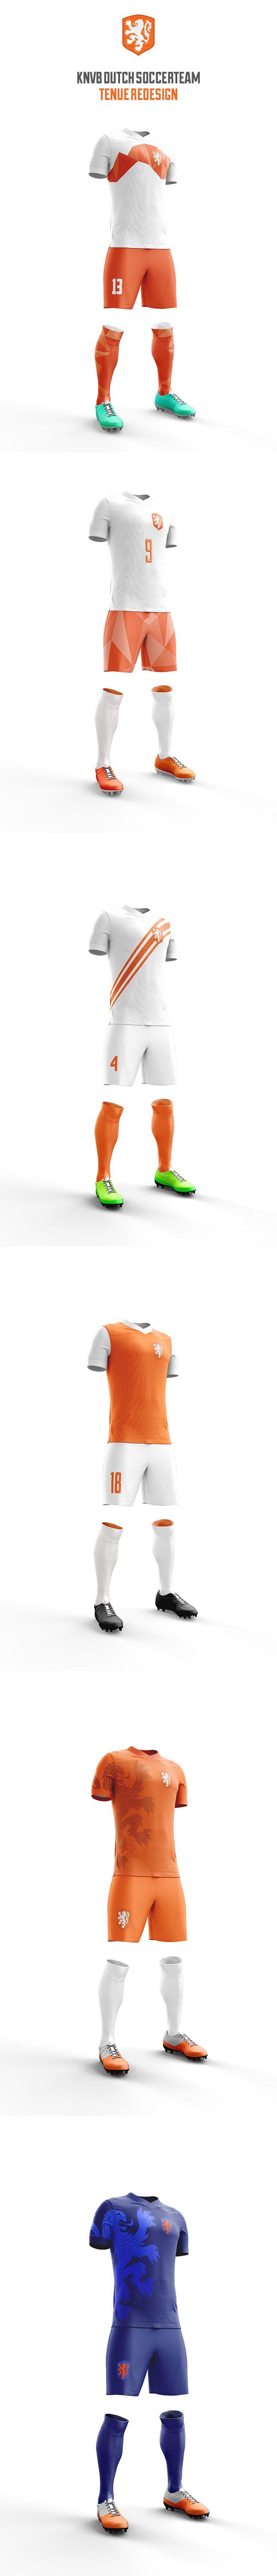 Redesign Dutch soccer tenue on Behance